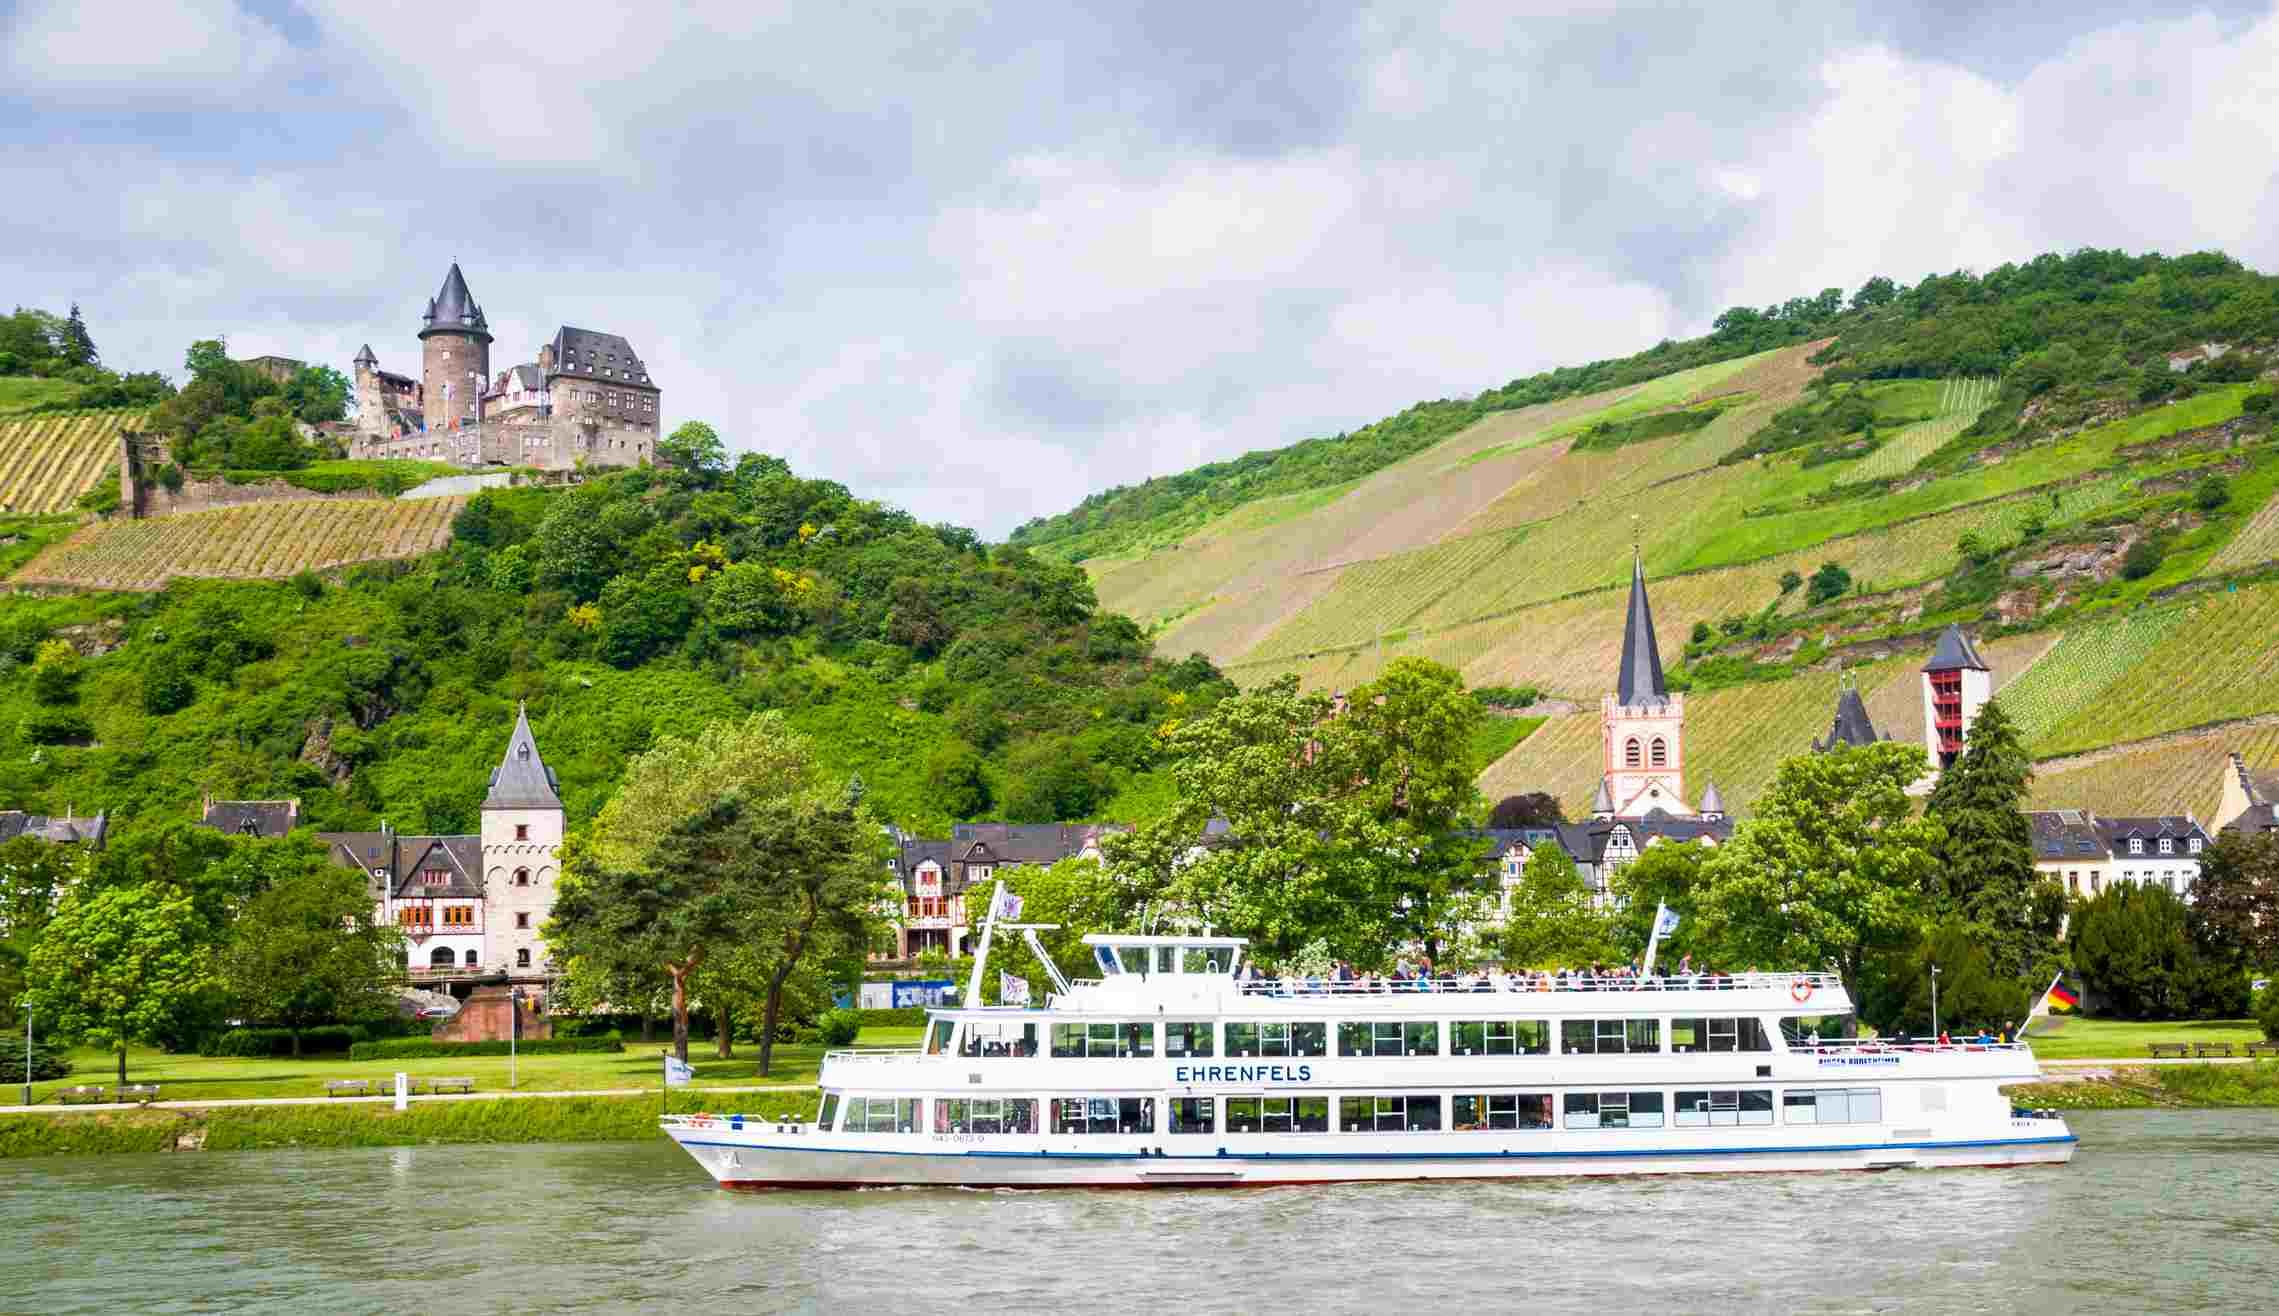 Rhine Cruise by Bacharach